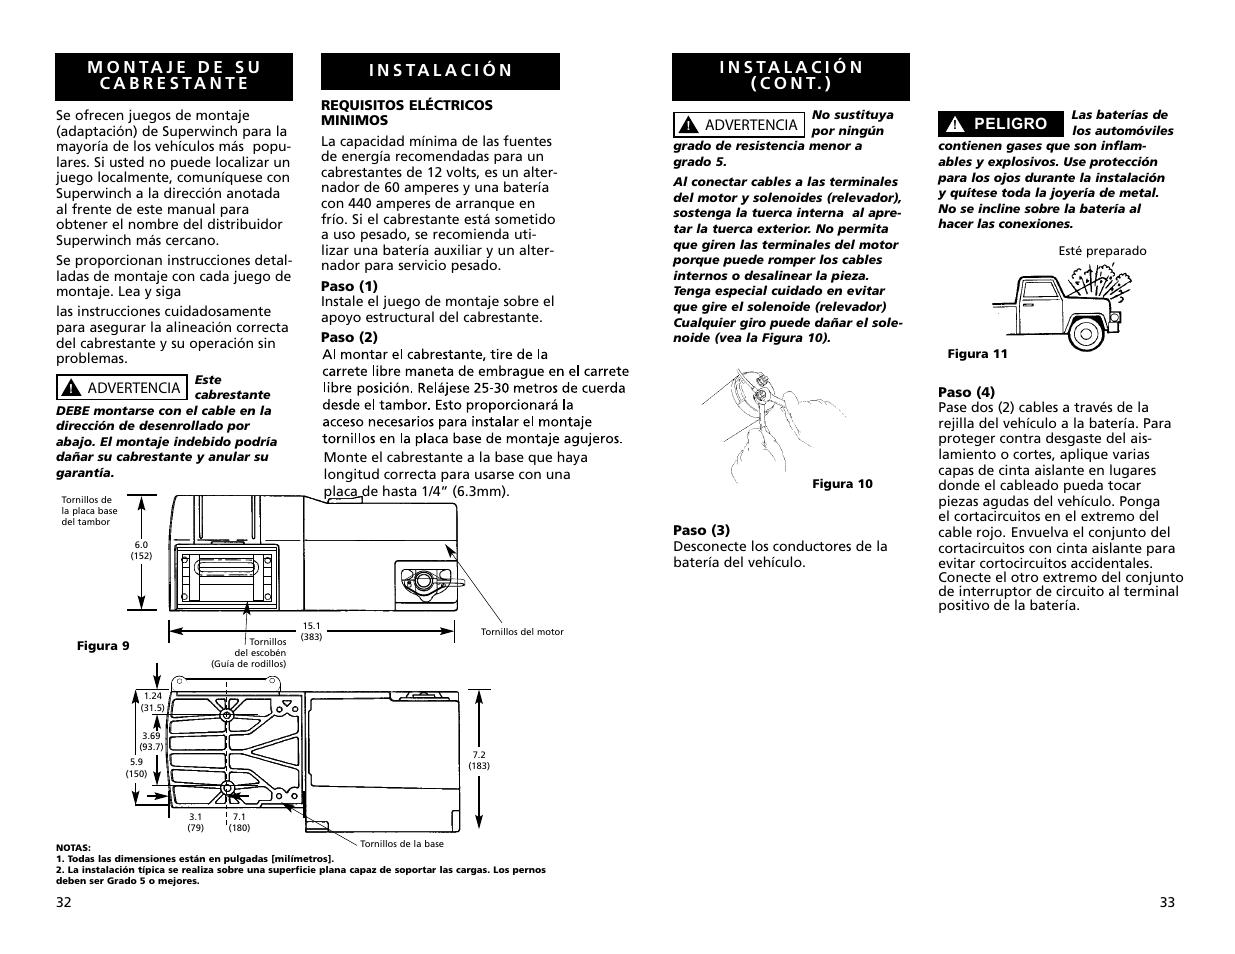 superwinch s4000 1 814 kgs 12v user manual page 17 33 rh manualsdir com